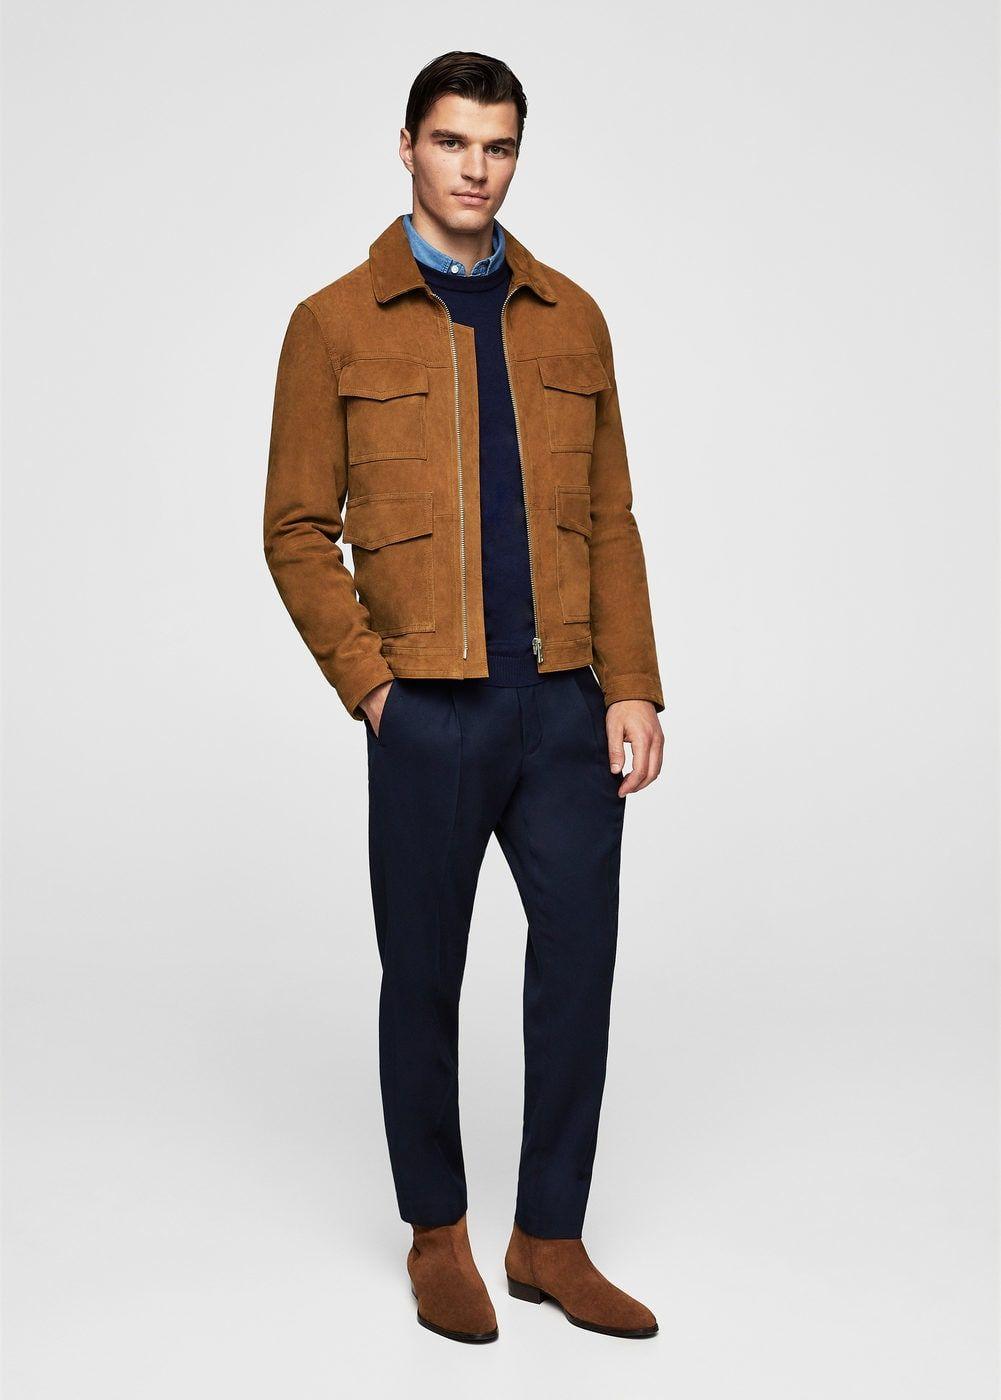 0606ea37dc9 flap-pocket suede jacket - Men in 2019